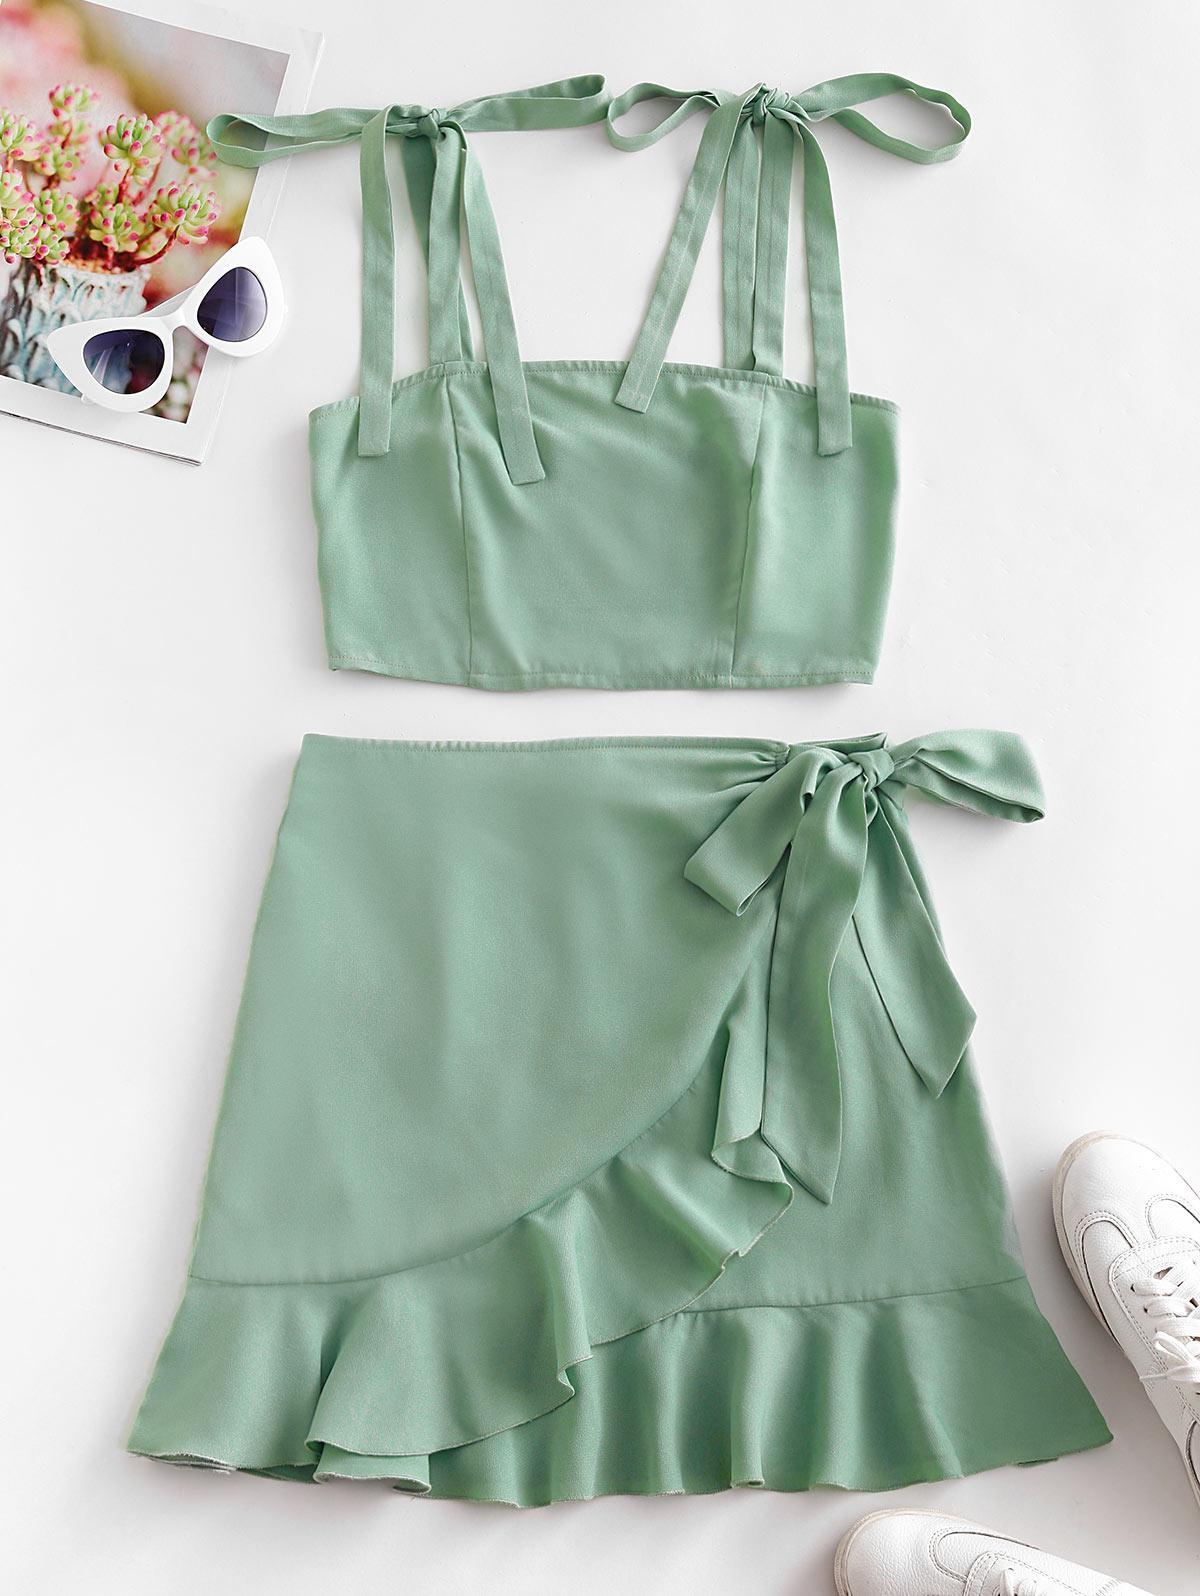 ZAFUL Tie Shoulder Shirred Ruffle Overlap Skirt Set